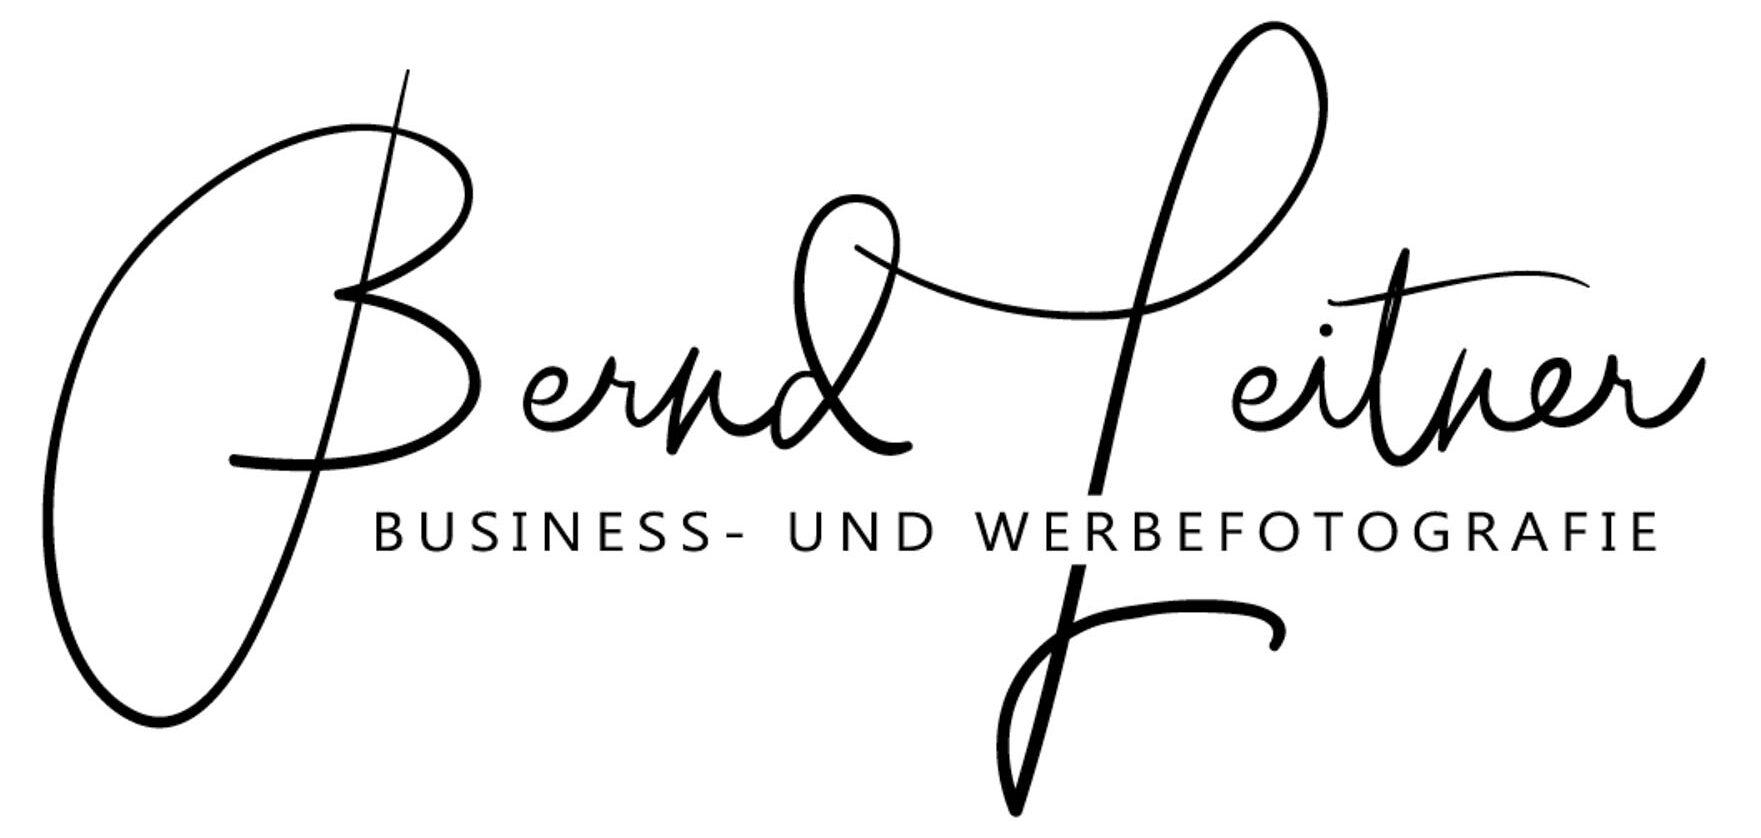 Bernd Leitner Fotodesign